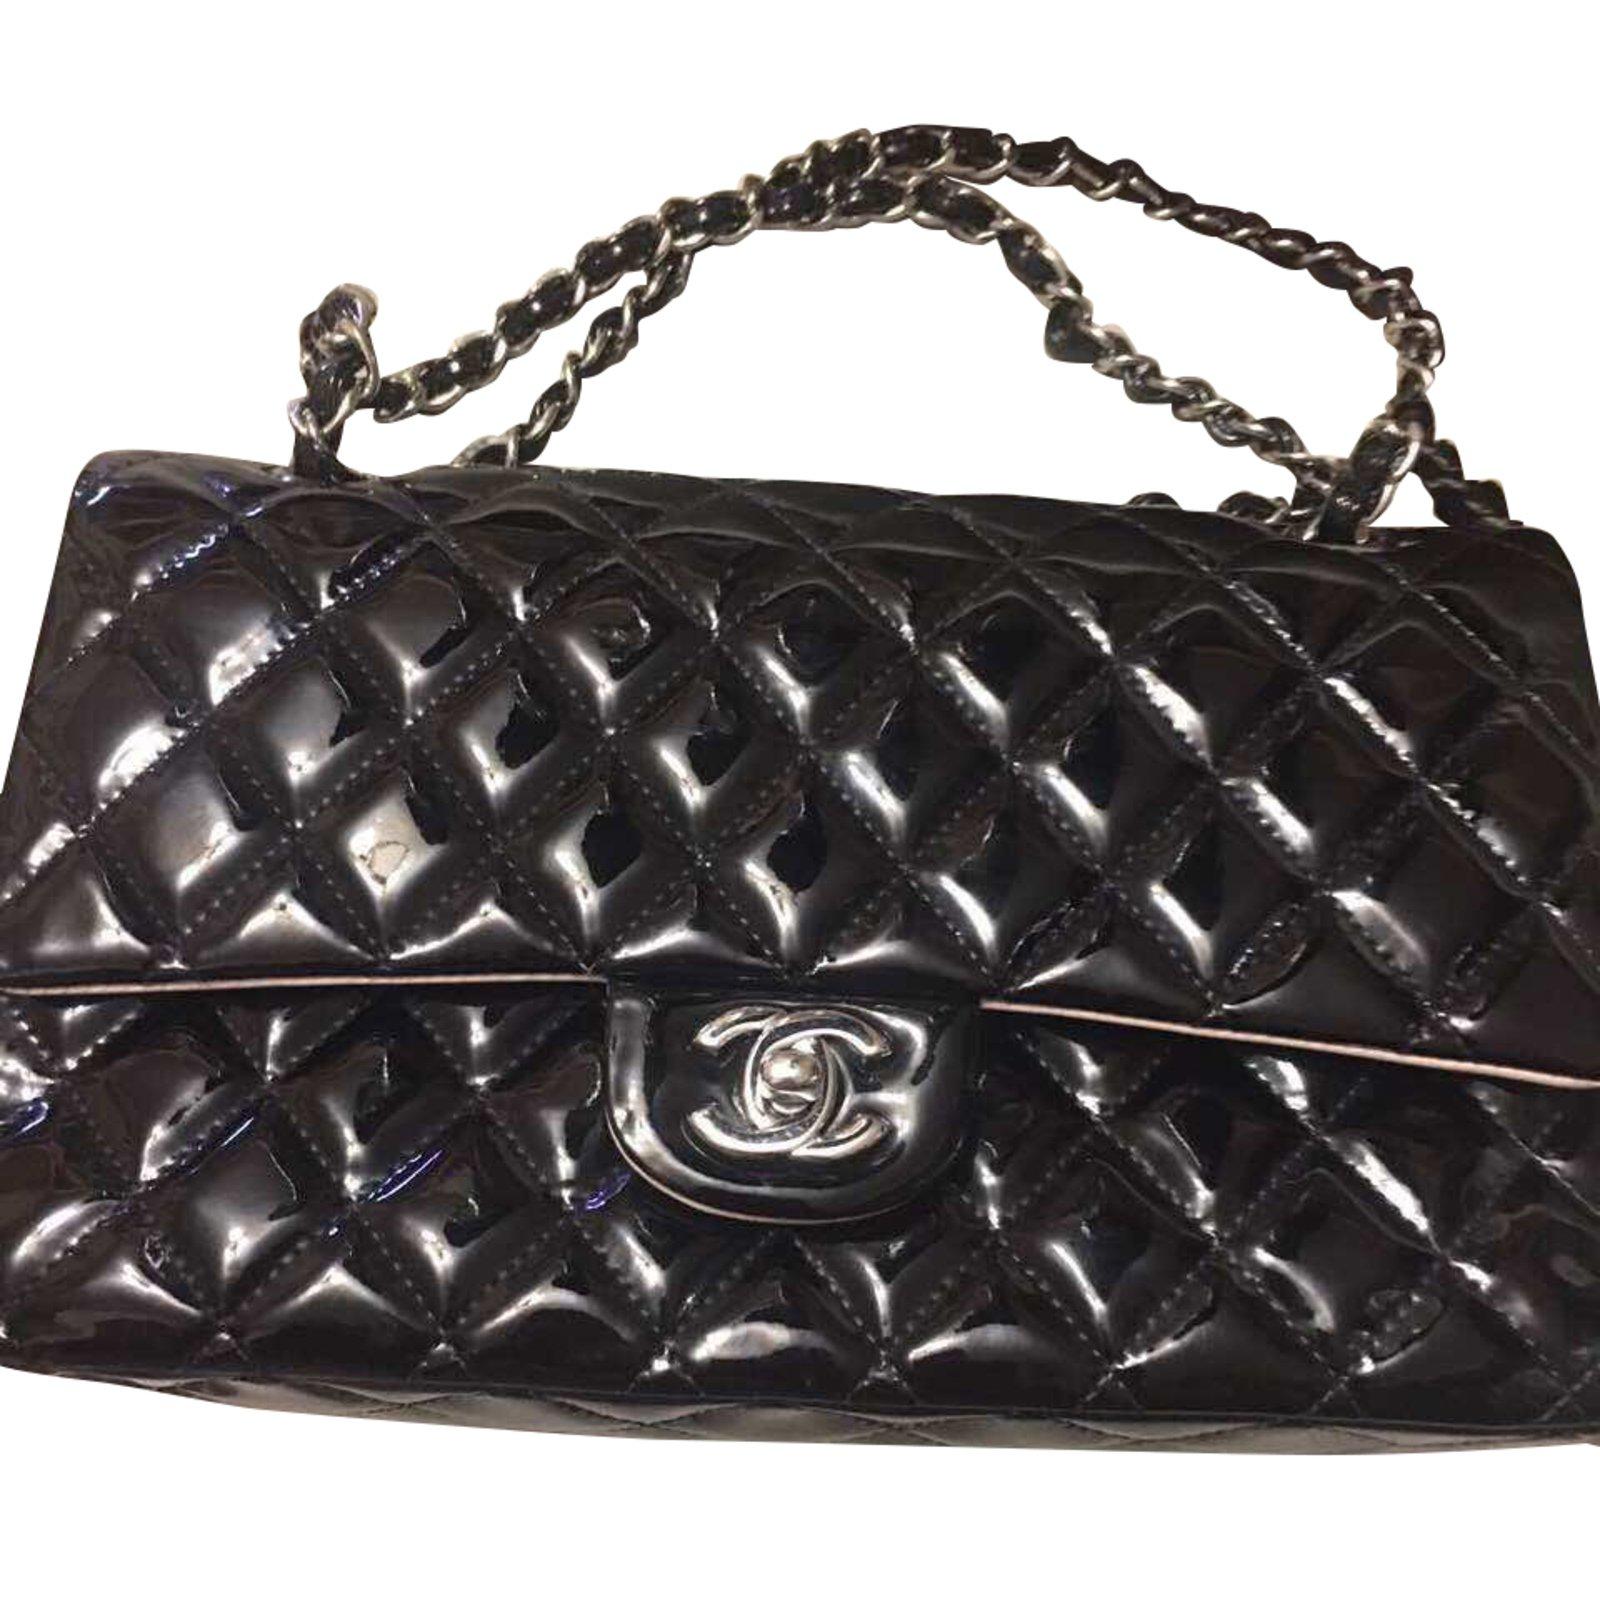 9b61436b01f232 Chanel 2.55 classic double flap Handbags Patent leather Black ref.39799